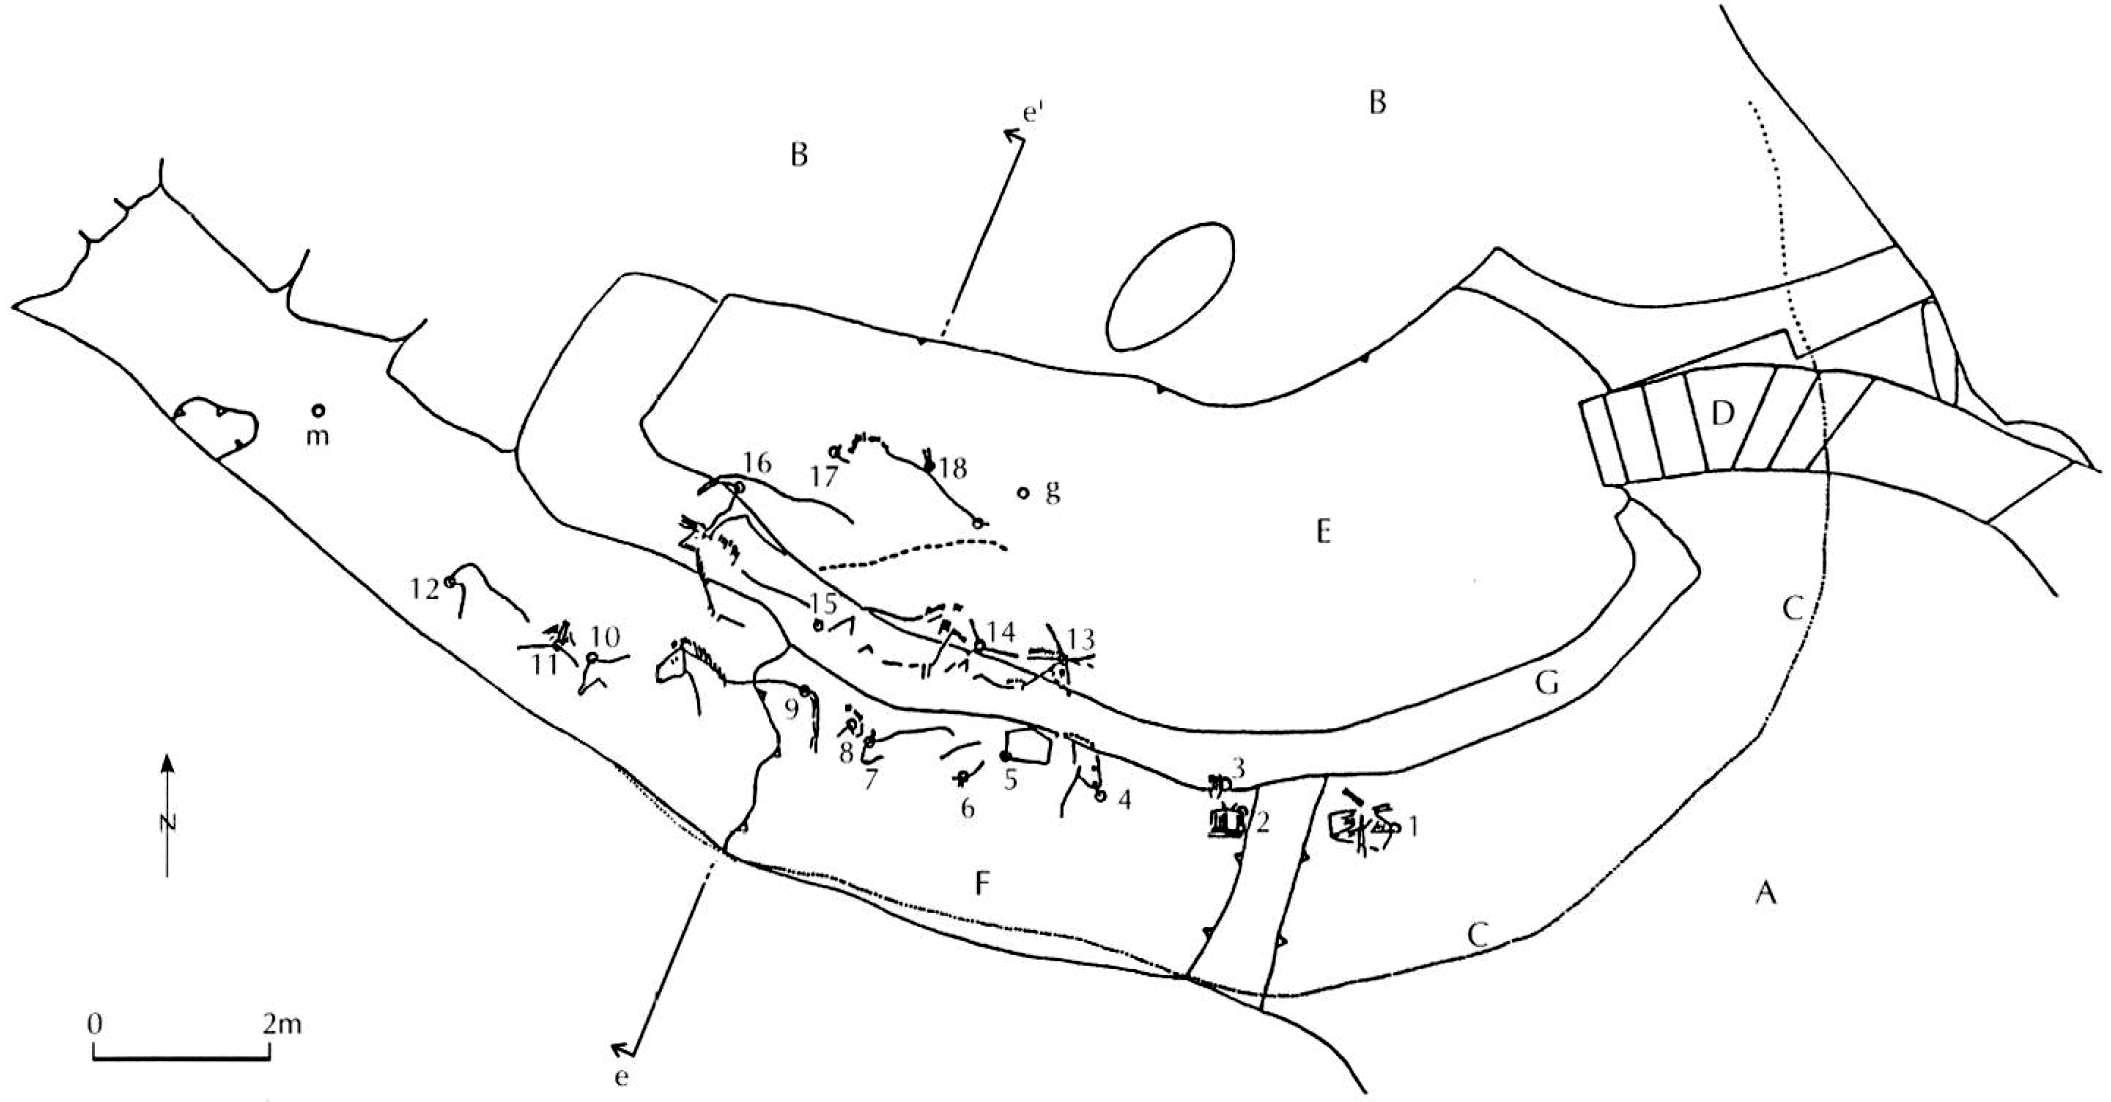 Bara Bahau Cave La Grotte De Ice Age Art Free Download Iceman Wiring Diagram